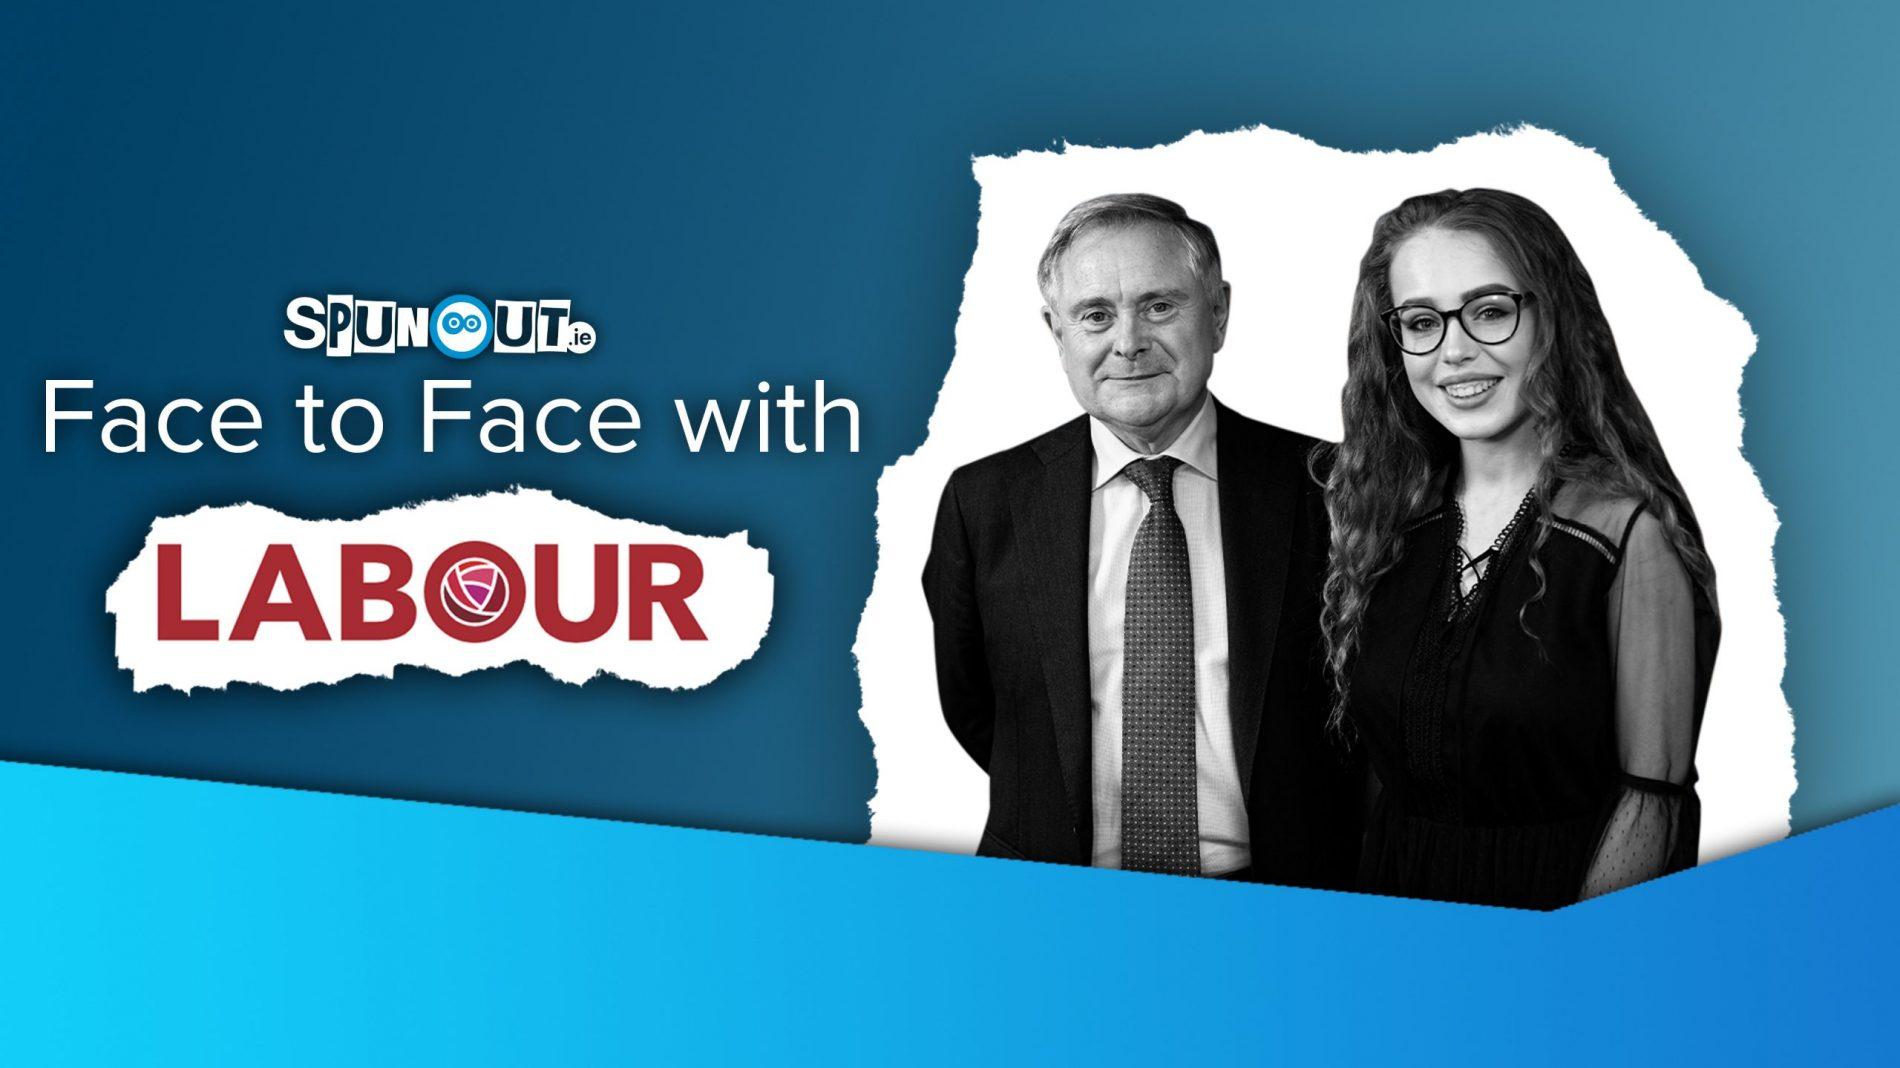 Face-to-Face-Labour-Thumbnail-16-9